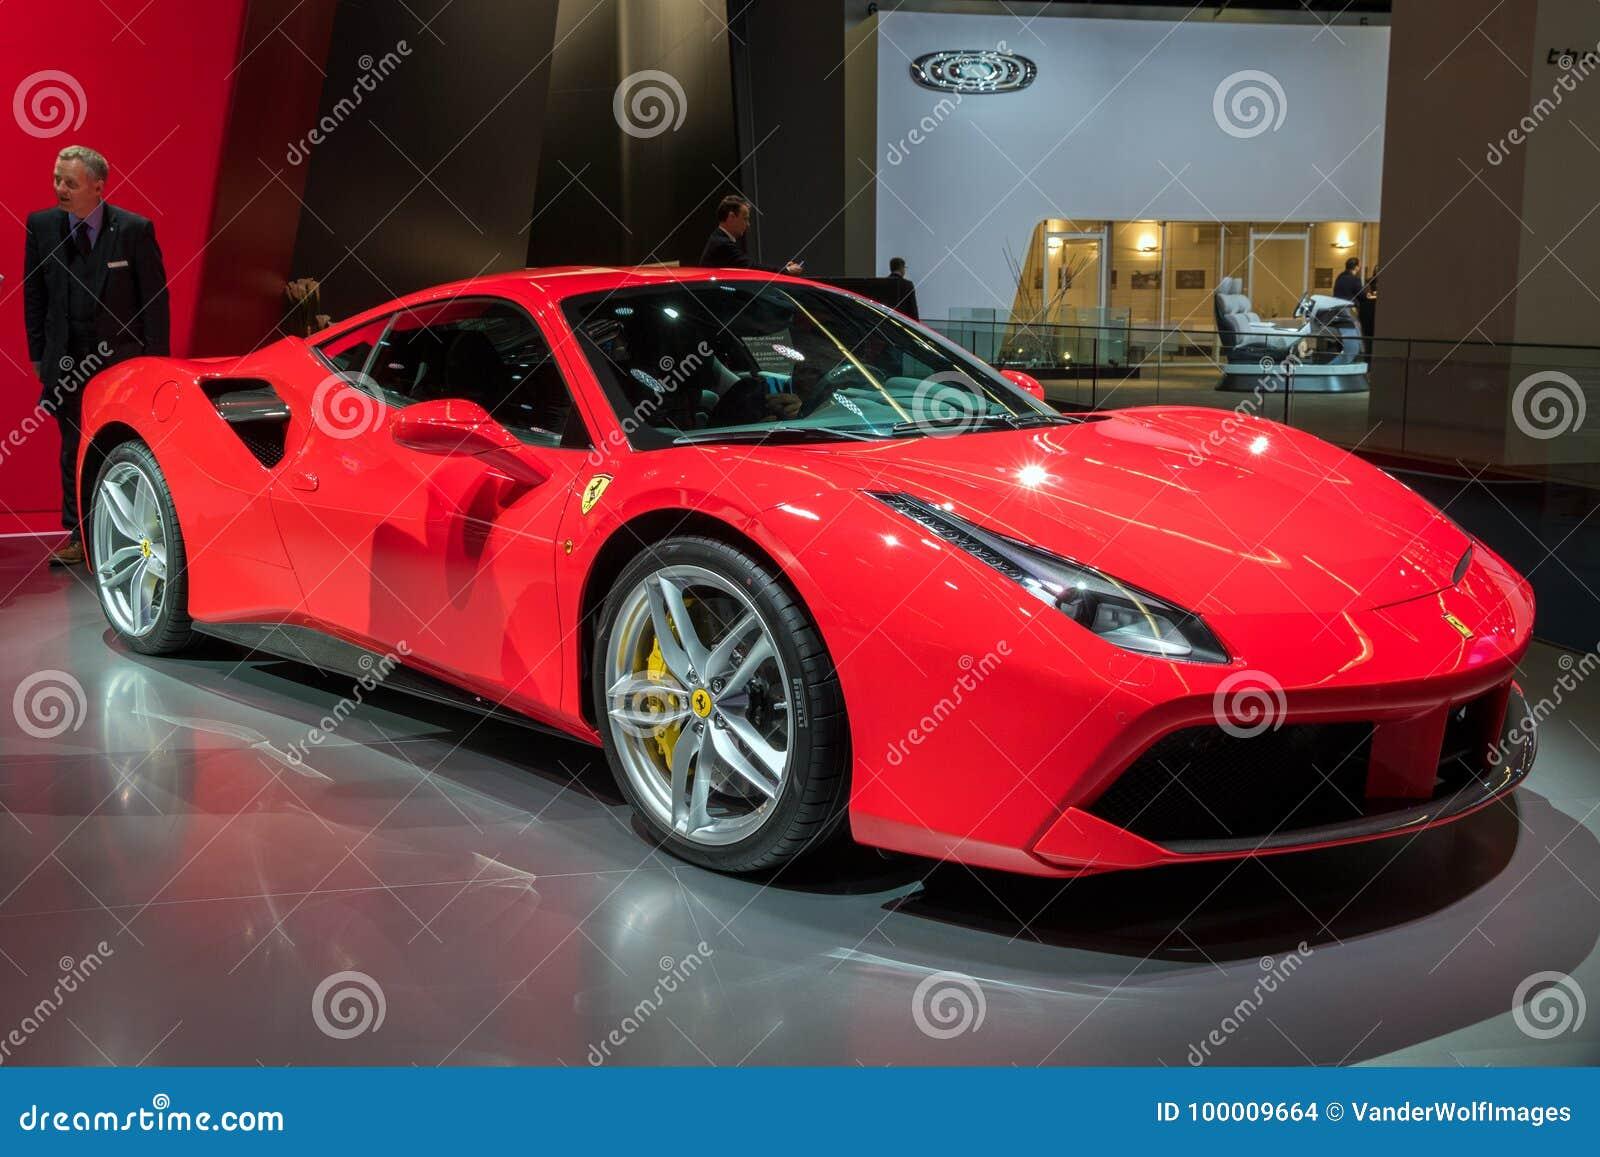 Ferrari 488 Gtb Spider Sports Car Editorial Stock Image Image Of